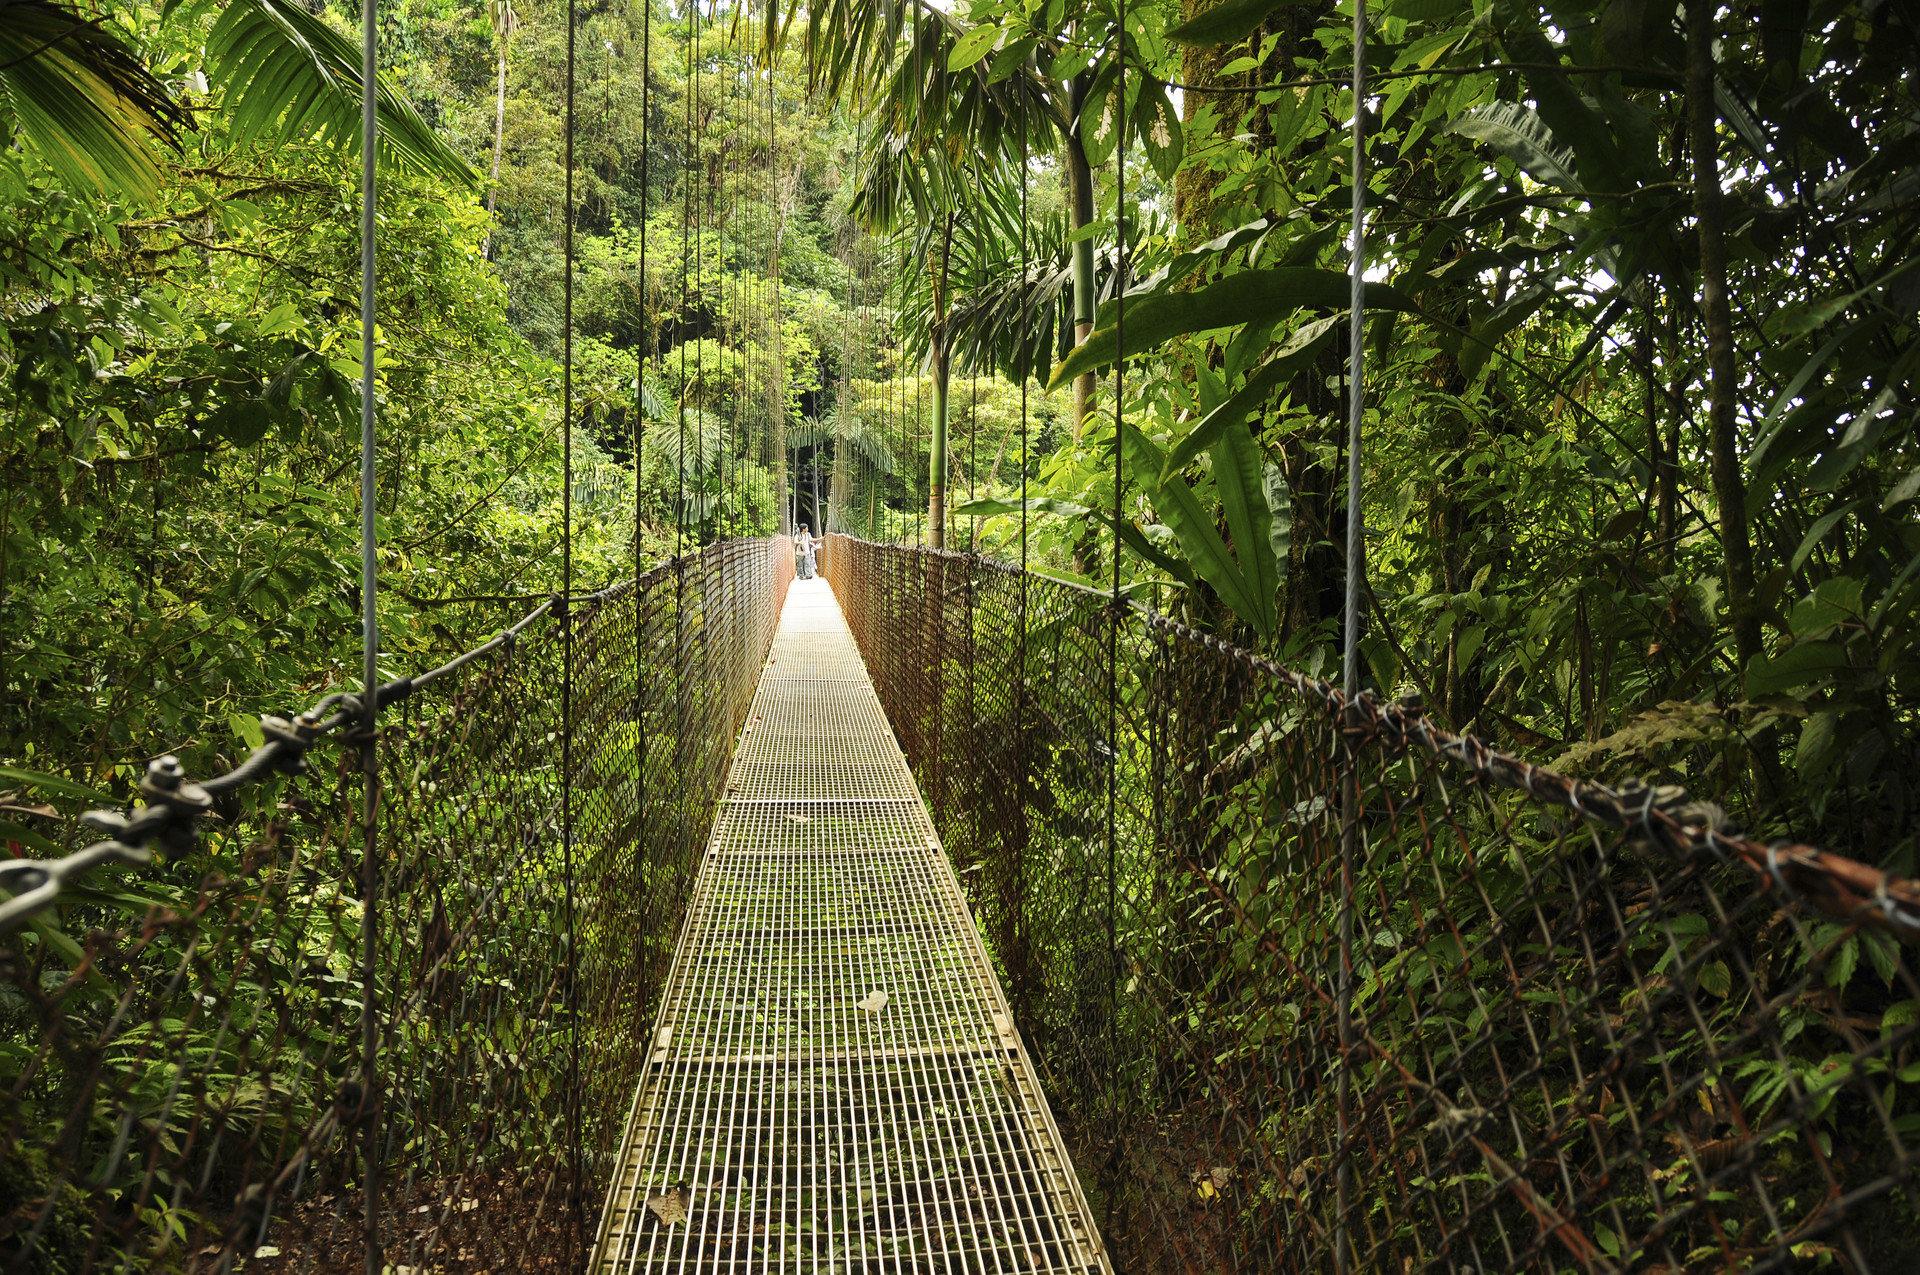 Adventure Trip Ideas tree bridge building habitat outdoor Nature natural environment green Forest rainforest botany Jungle woodland sunlight leaf Garden canopy walkway plant wood wooded